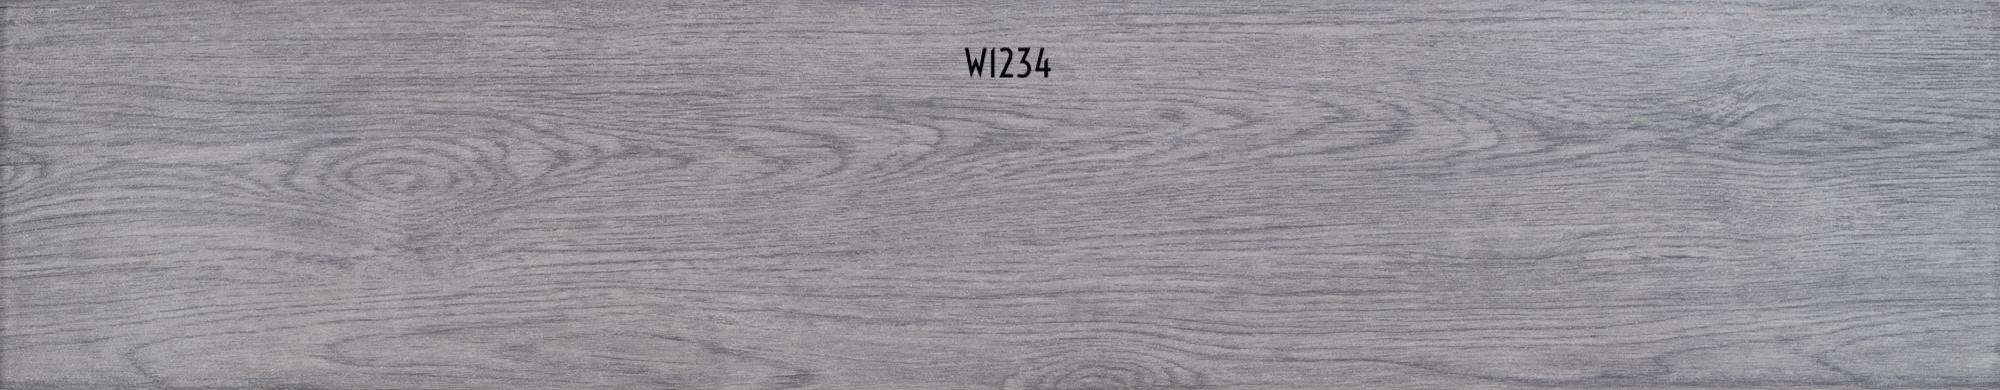 W1234